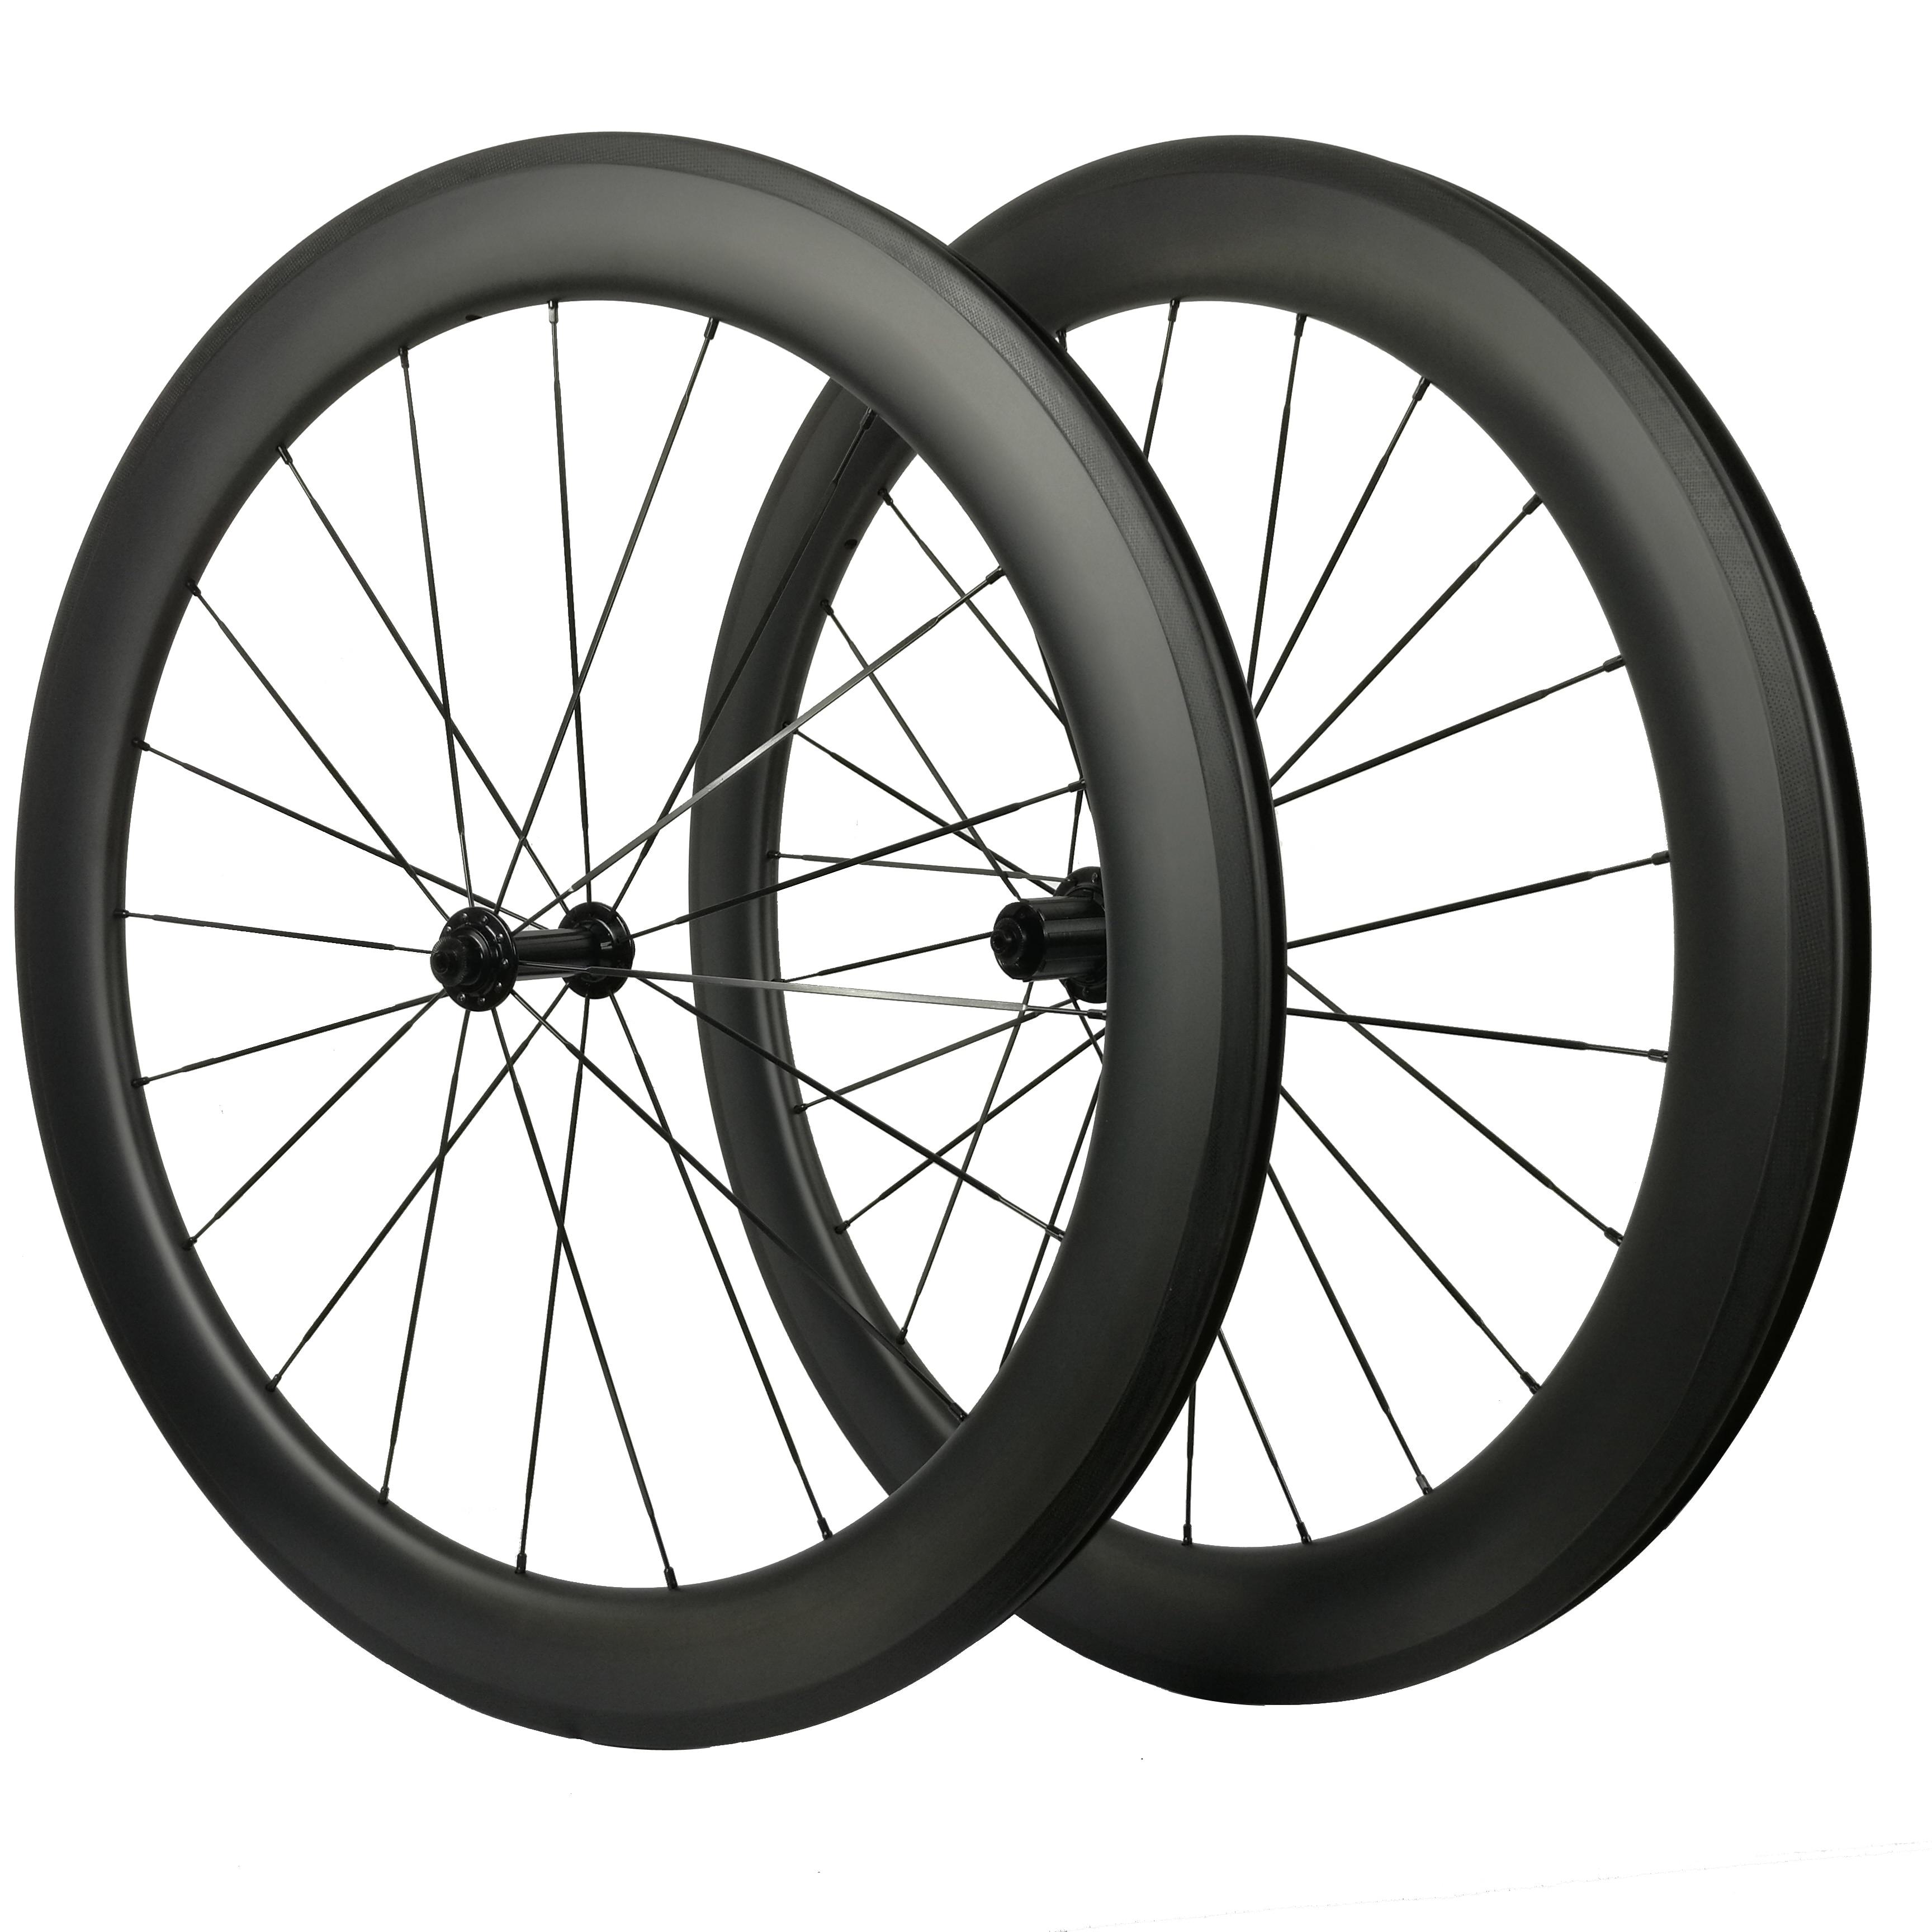 Ceramic R13 30mm 35mm 38mm 45mm 50mm 55mm 60mm 88mm carbon wheels 700c 23/25mm carbon bicycle wheels road bike carbon wheelset